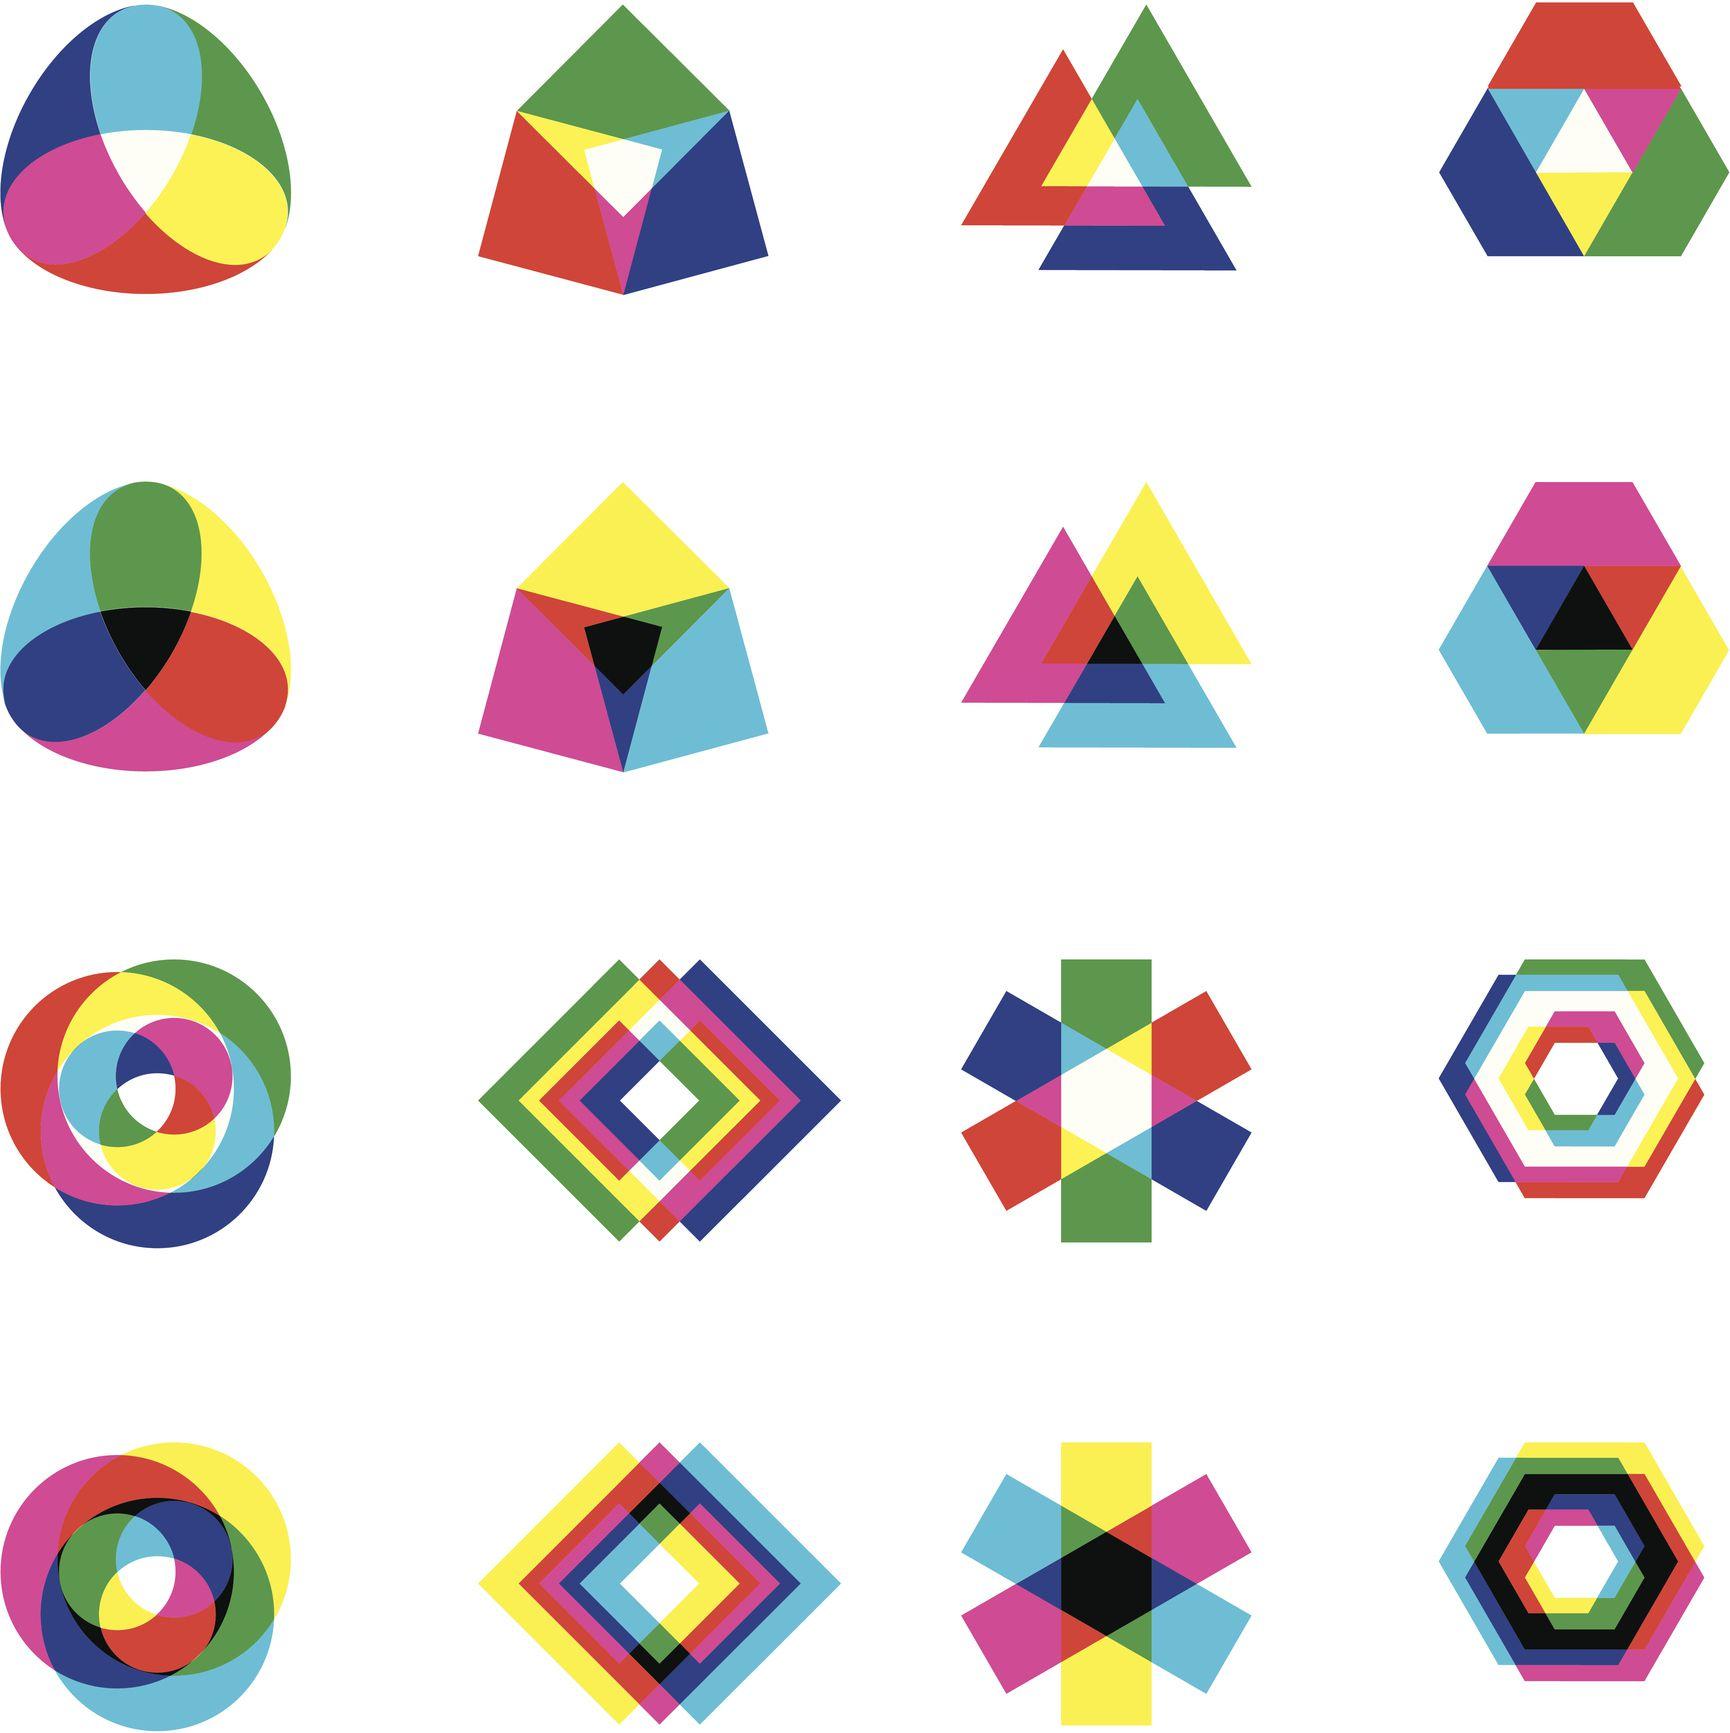 Figuras geom tricas y pol gonos for Las formas geometricas